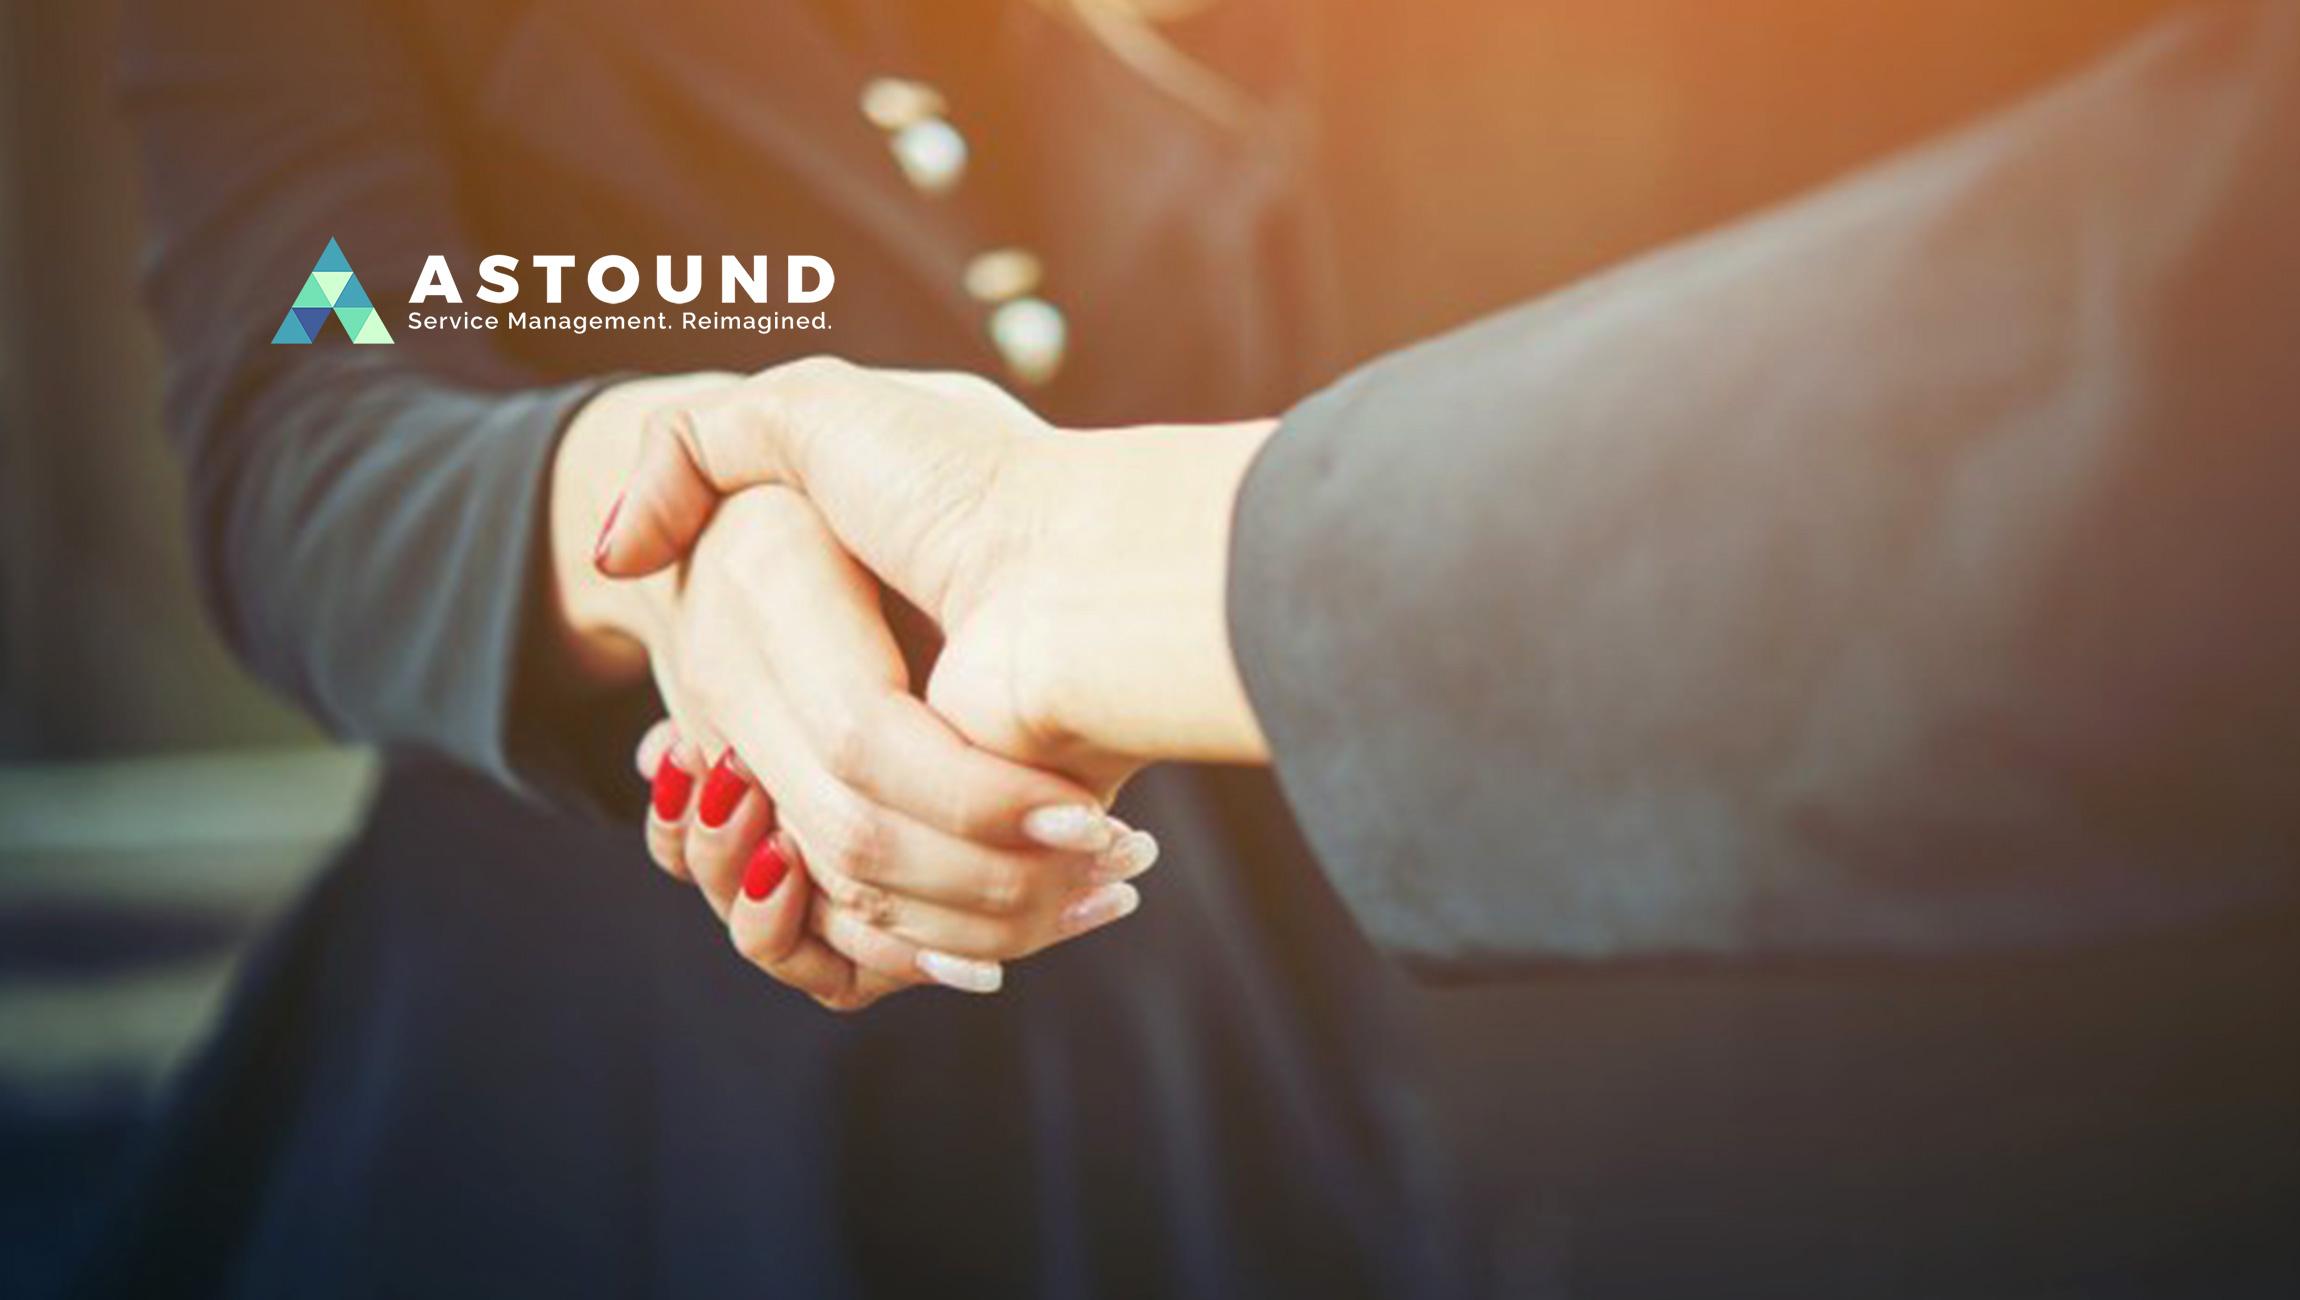 Astound and CAI Announce Strategic Partnership